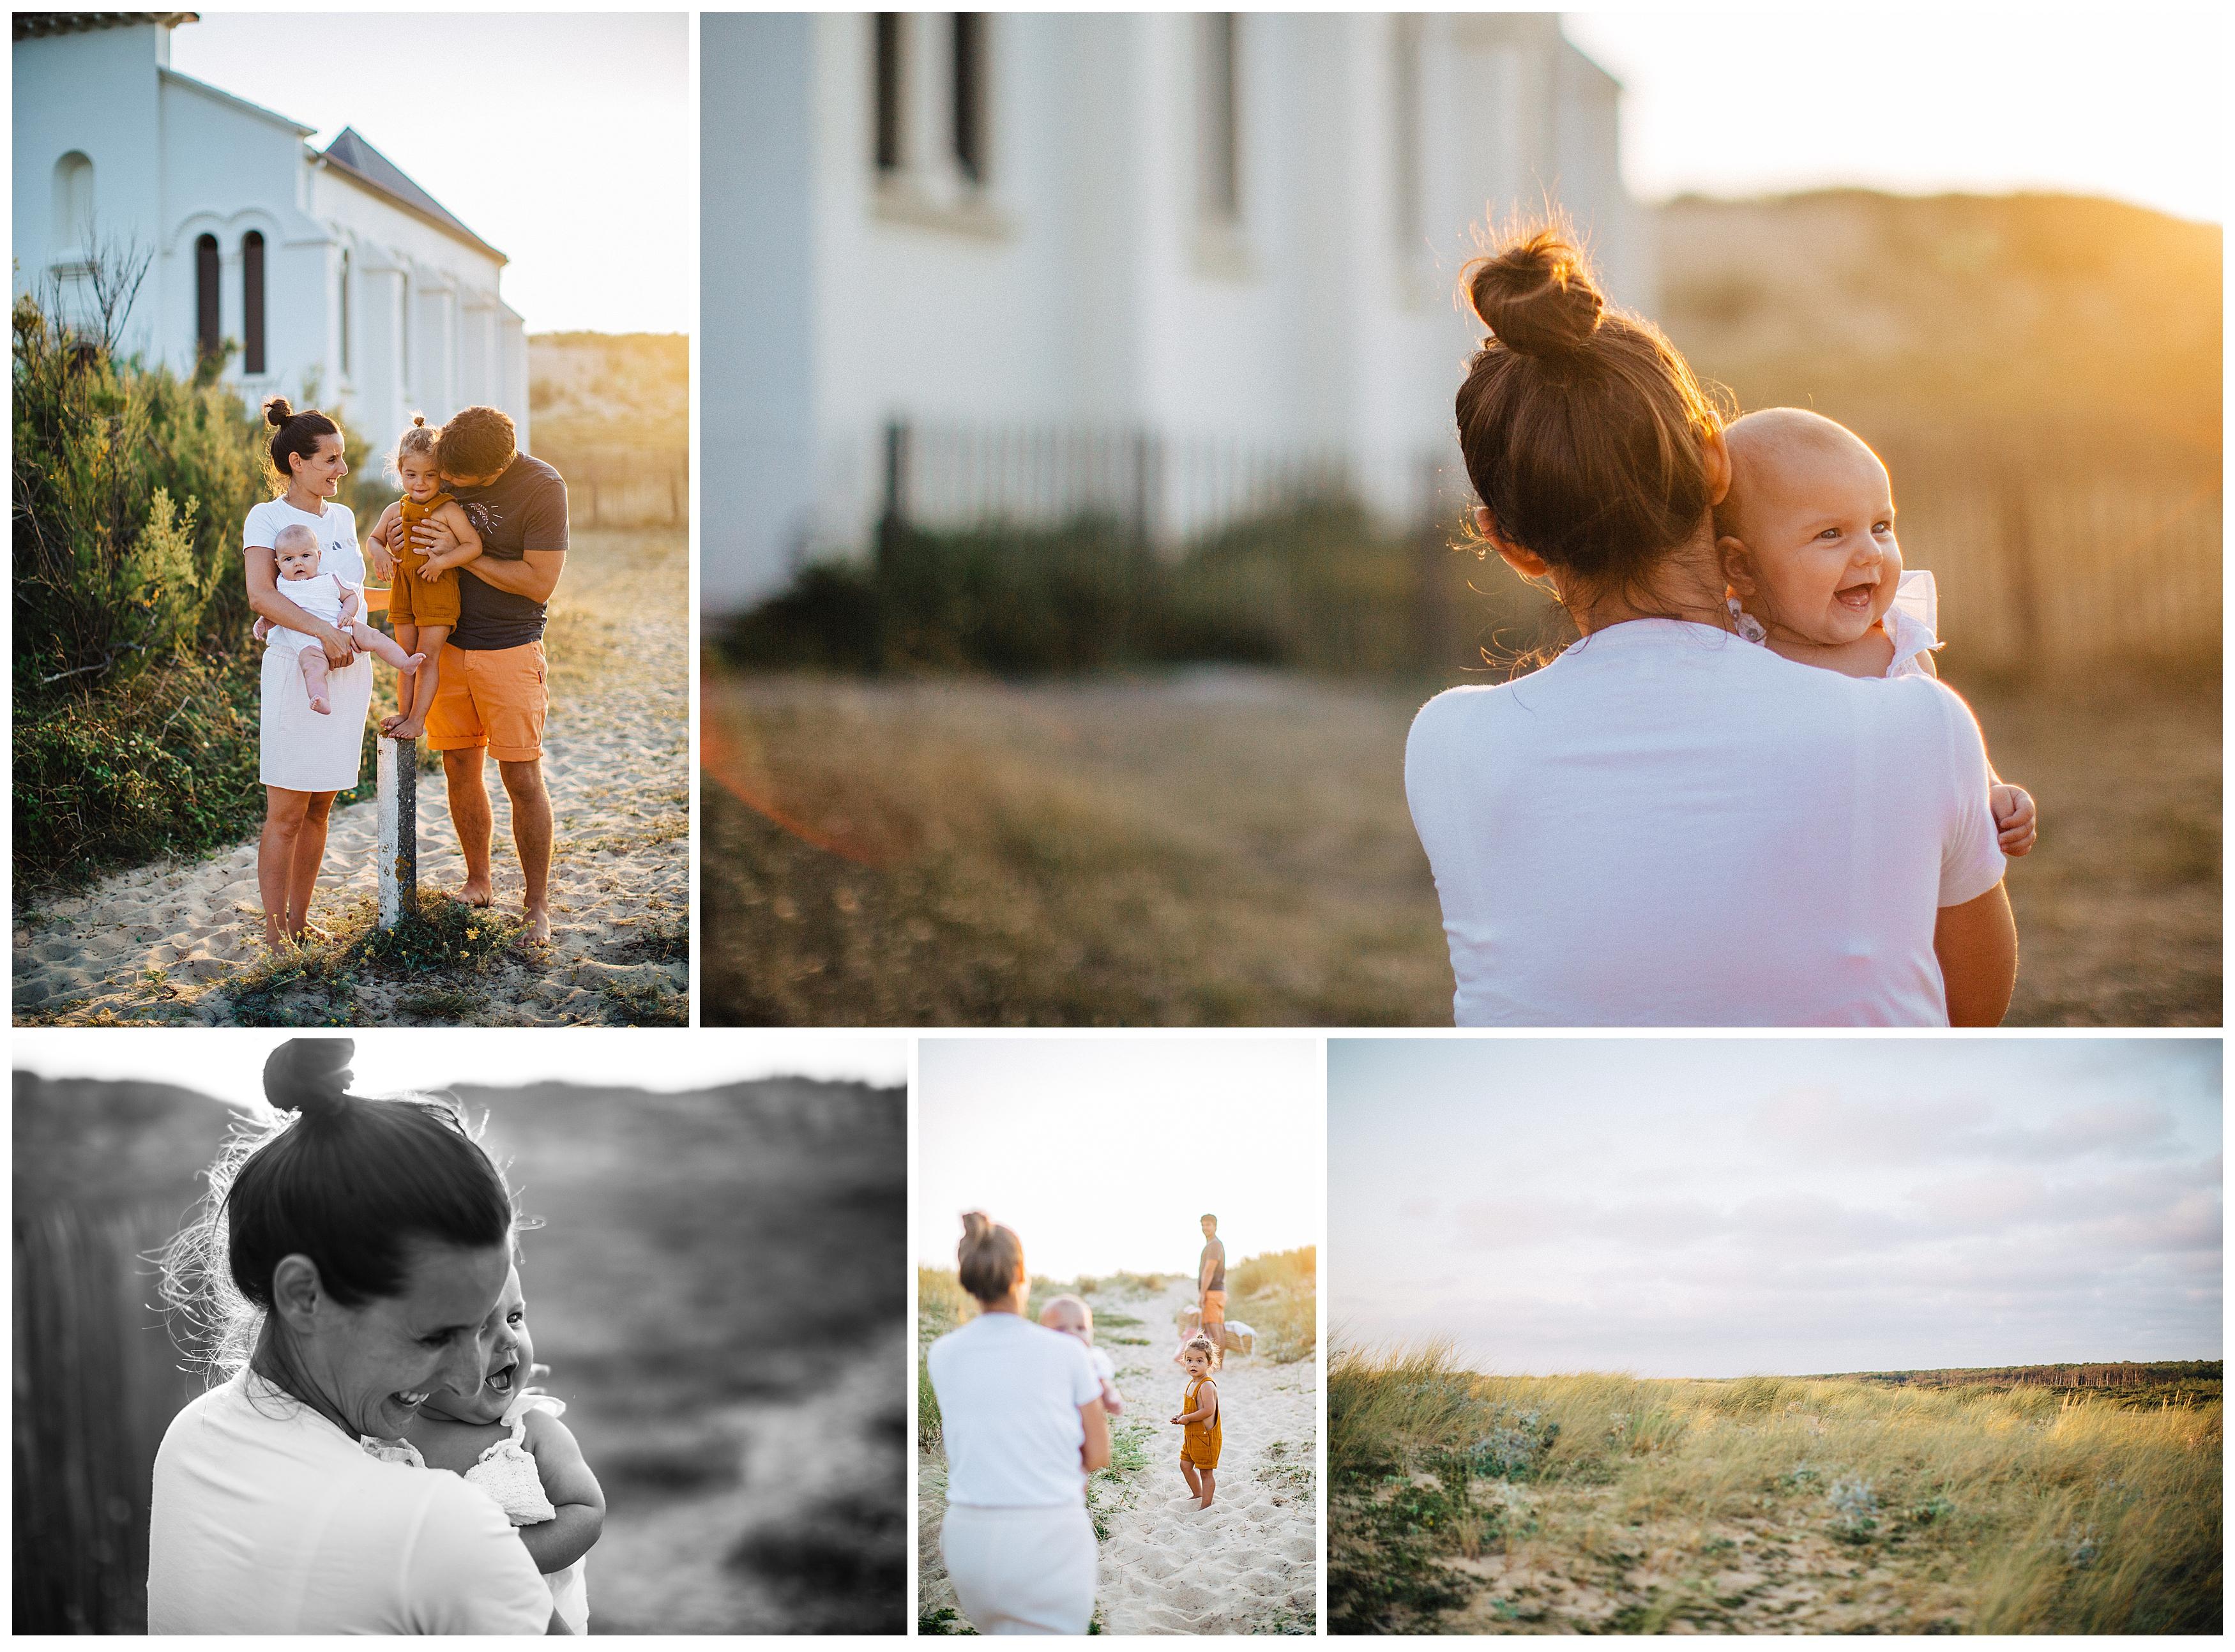 photographe famille a hossegor